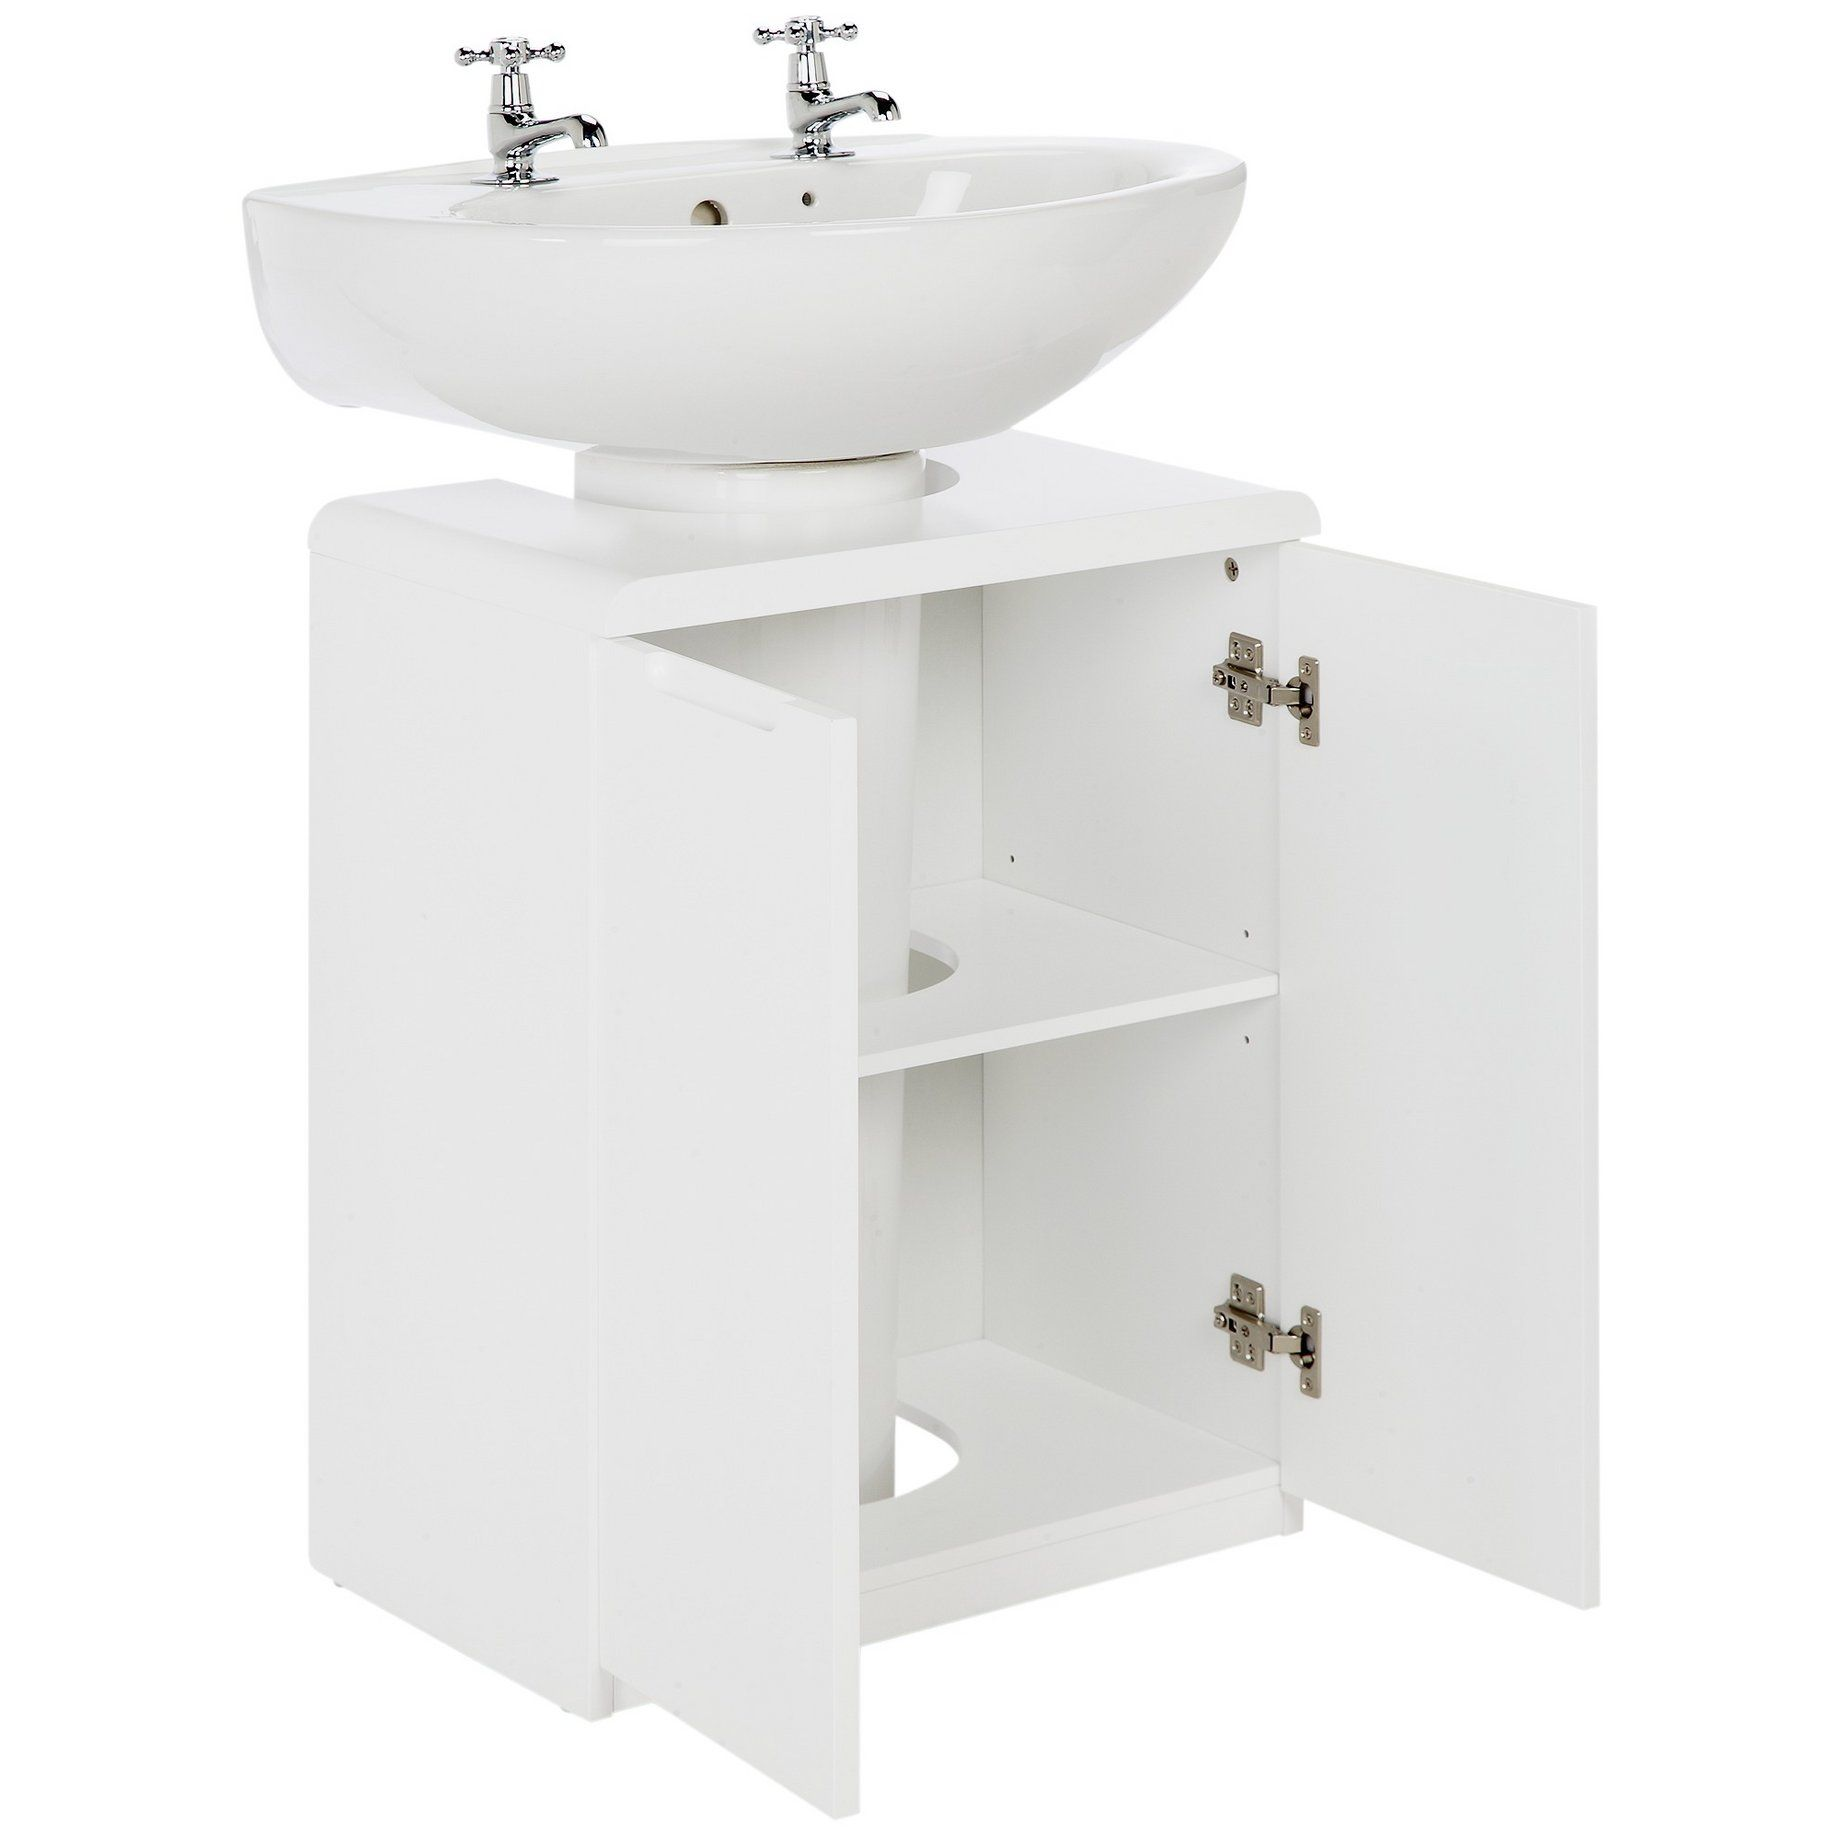 Buy Hygena Curve Under Sink Storage Unit - White at Argos.co.uk ...